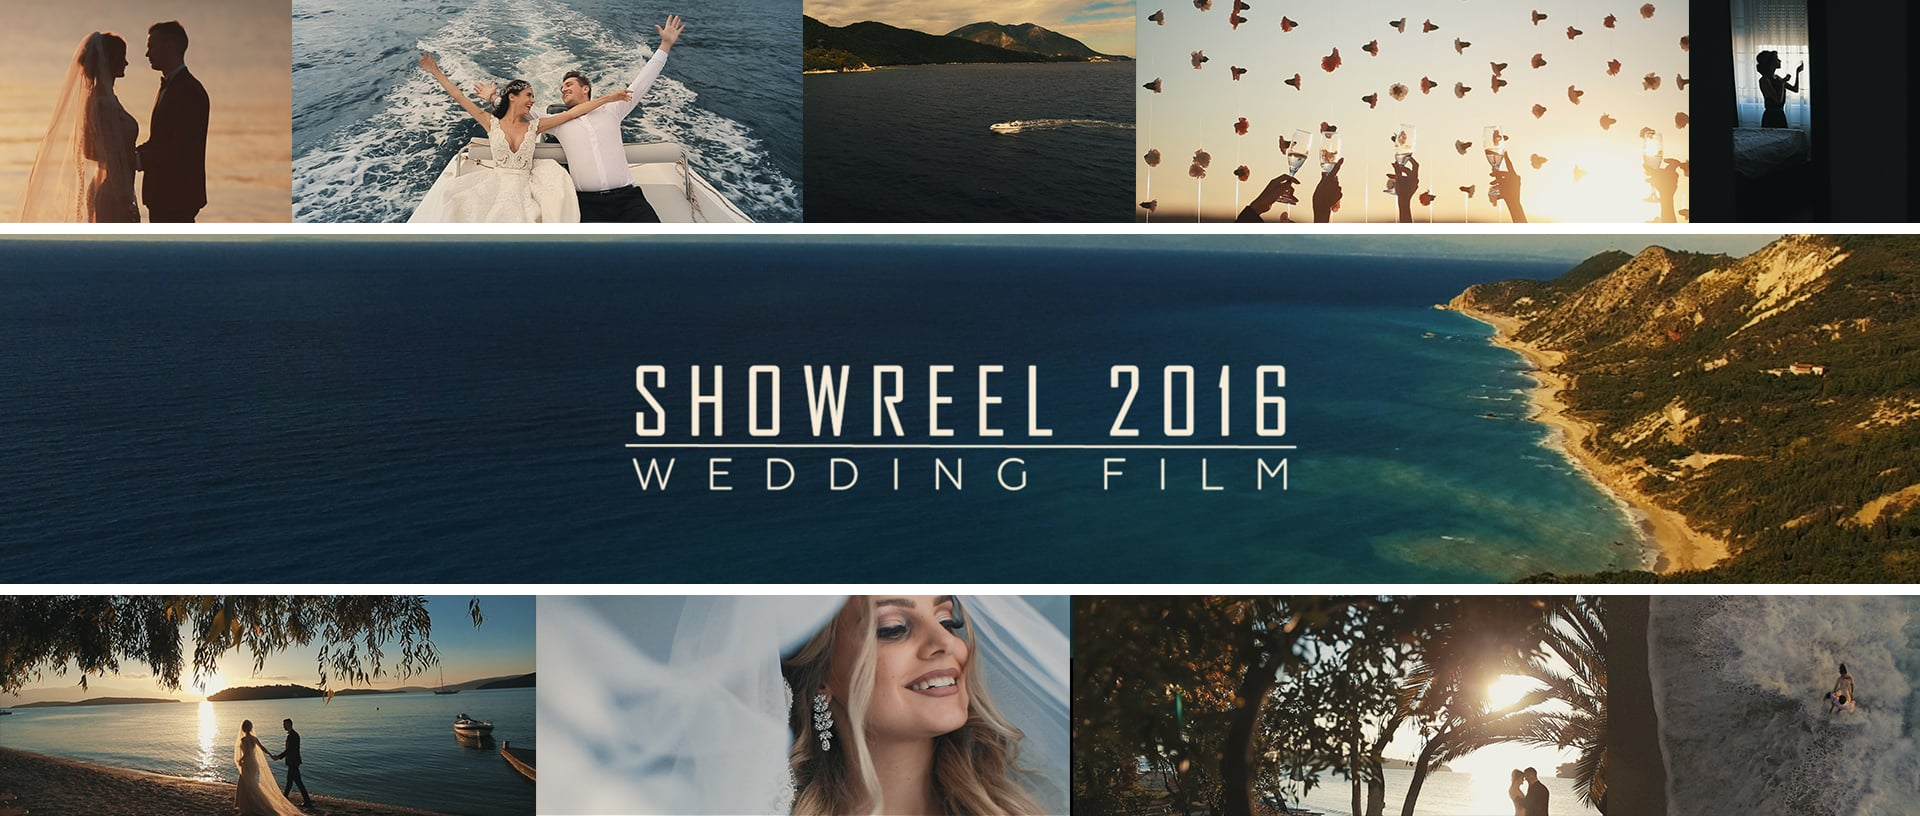 showreel 2016 - wedding film